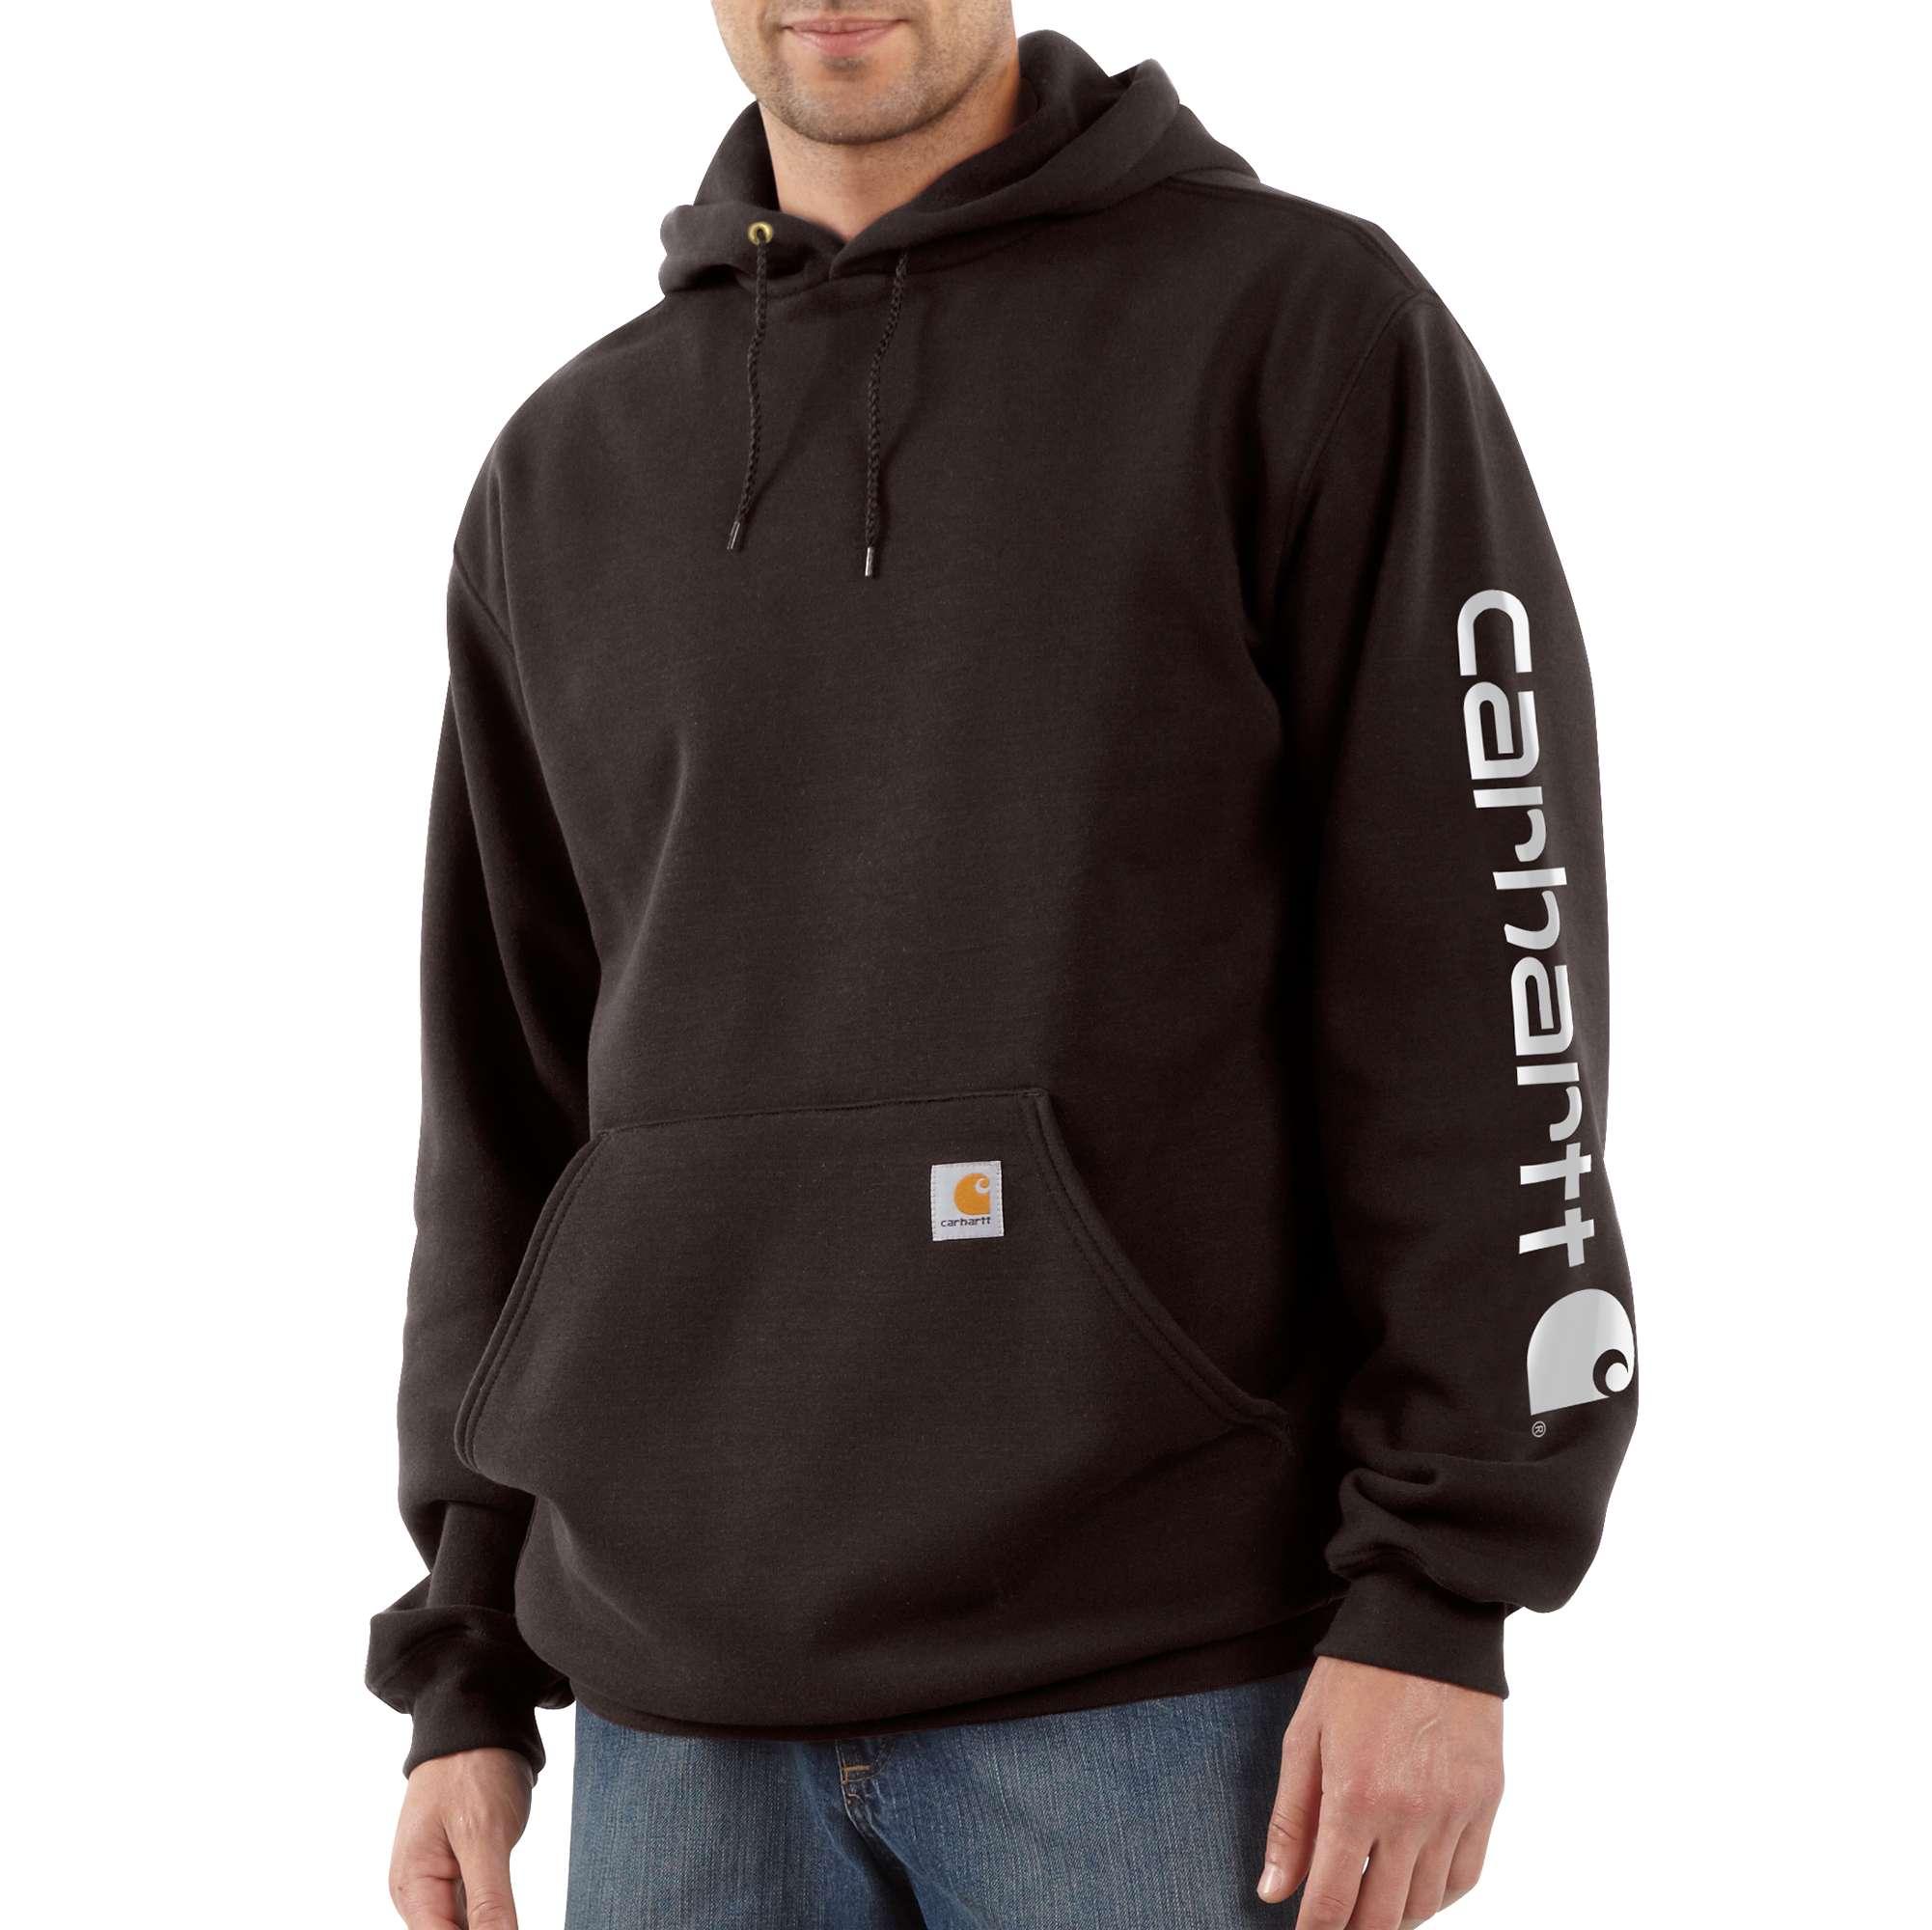 Men's Midweight Signature Logo Sleeve Hooded Sweatshirt, Dark Brown,Dark Natural, swatch